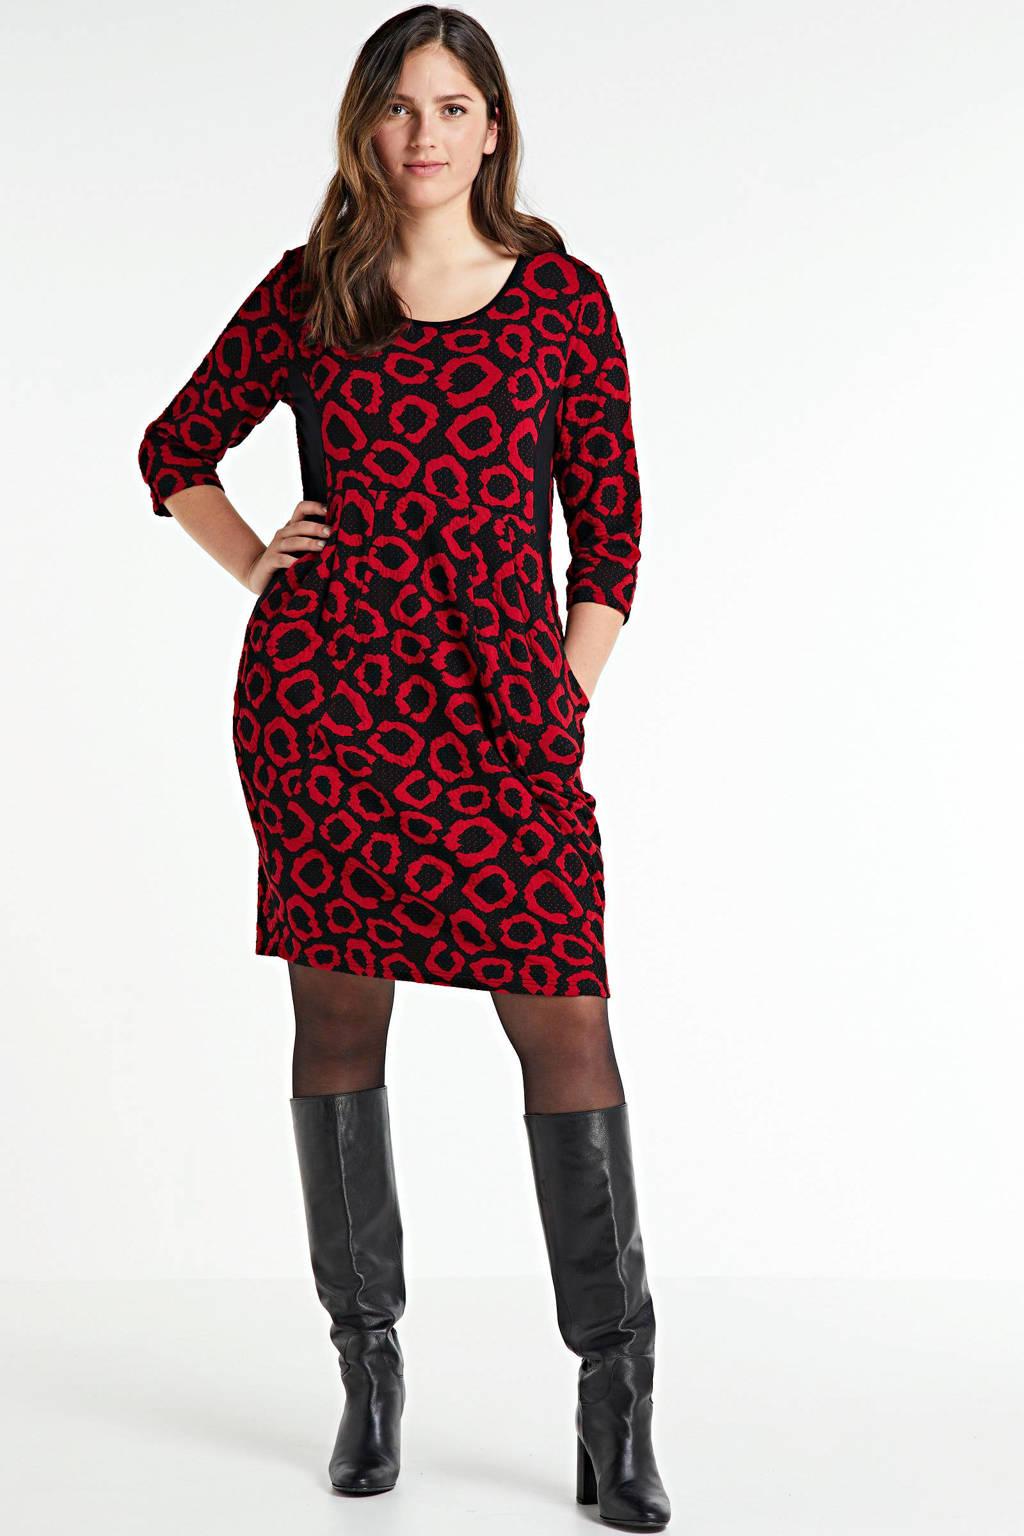 PONT NEUF jurk Bianco met plooien zwart/rood, Zwart/rood